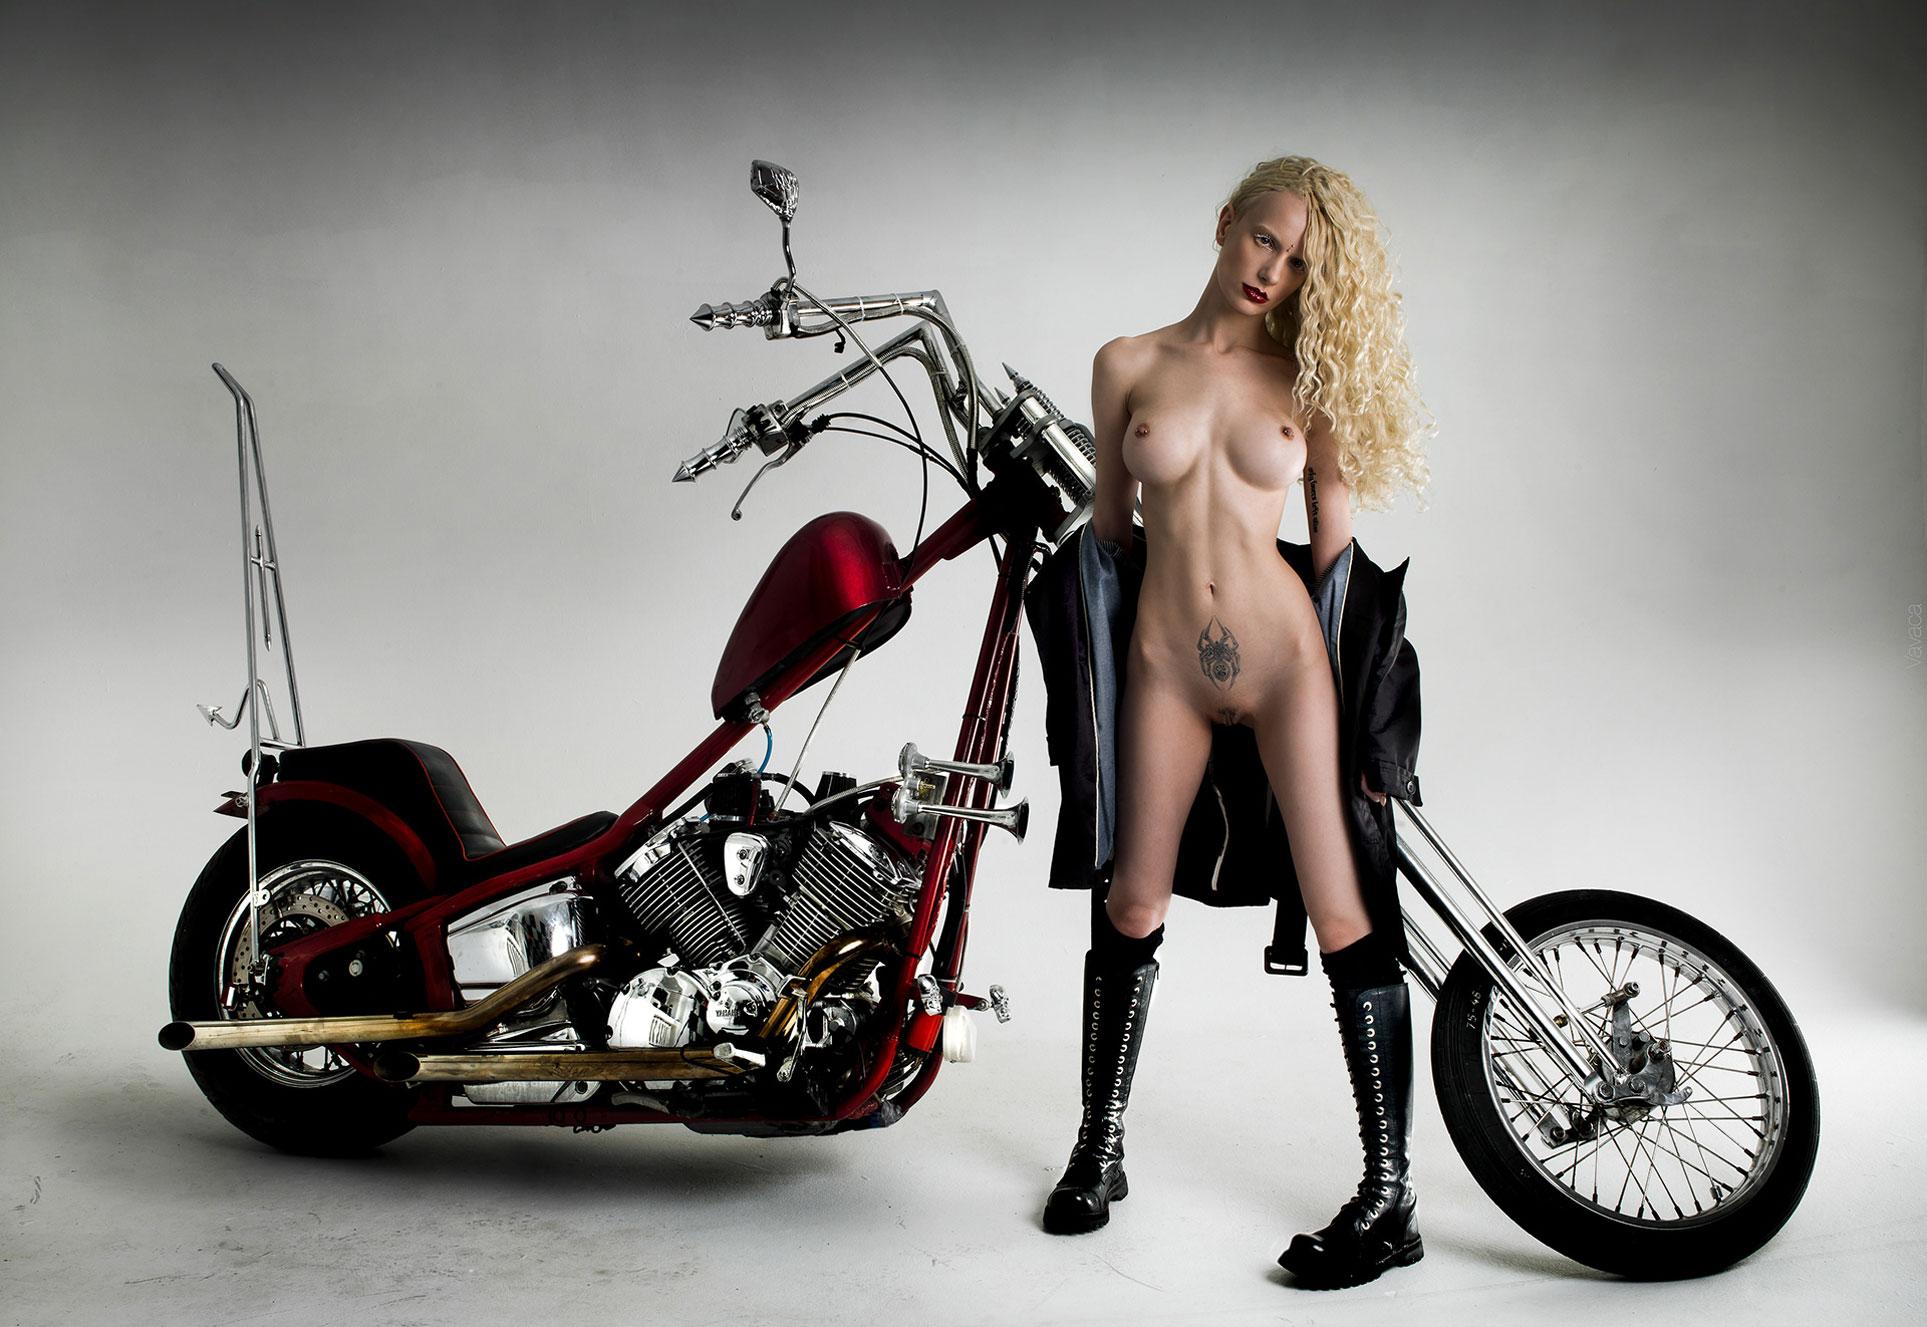 Мотоциклист и модель Алиса Лисс / Alisa Liss nude by Vladimir Nikolaev